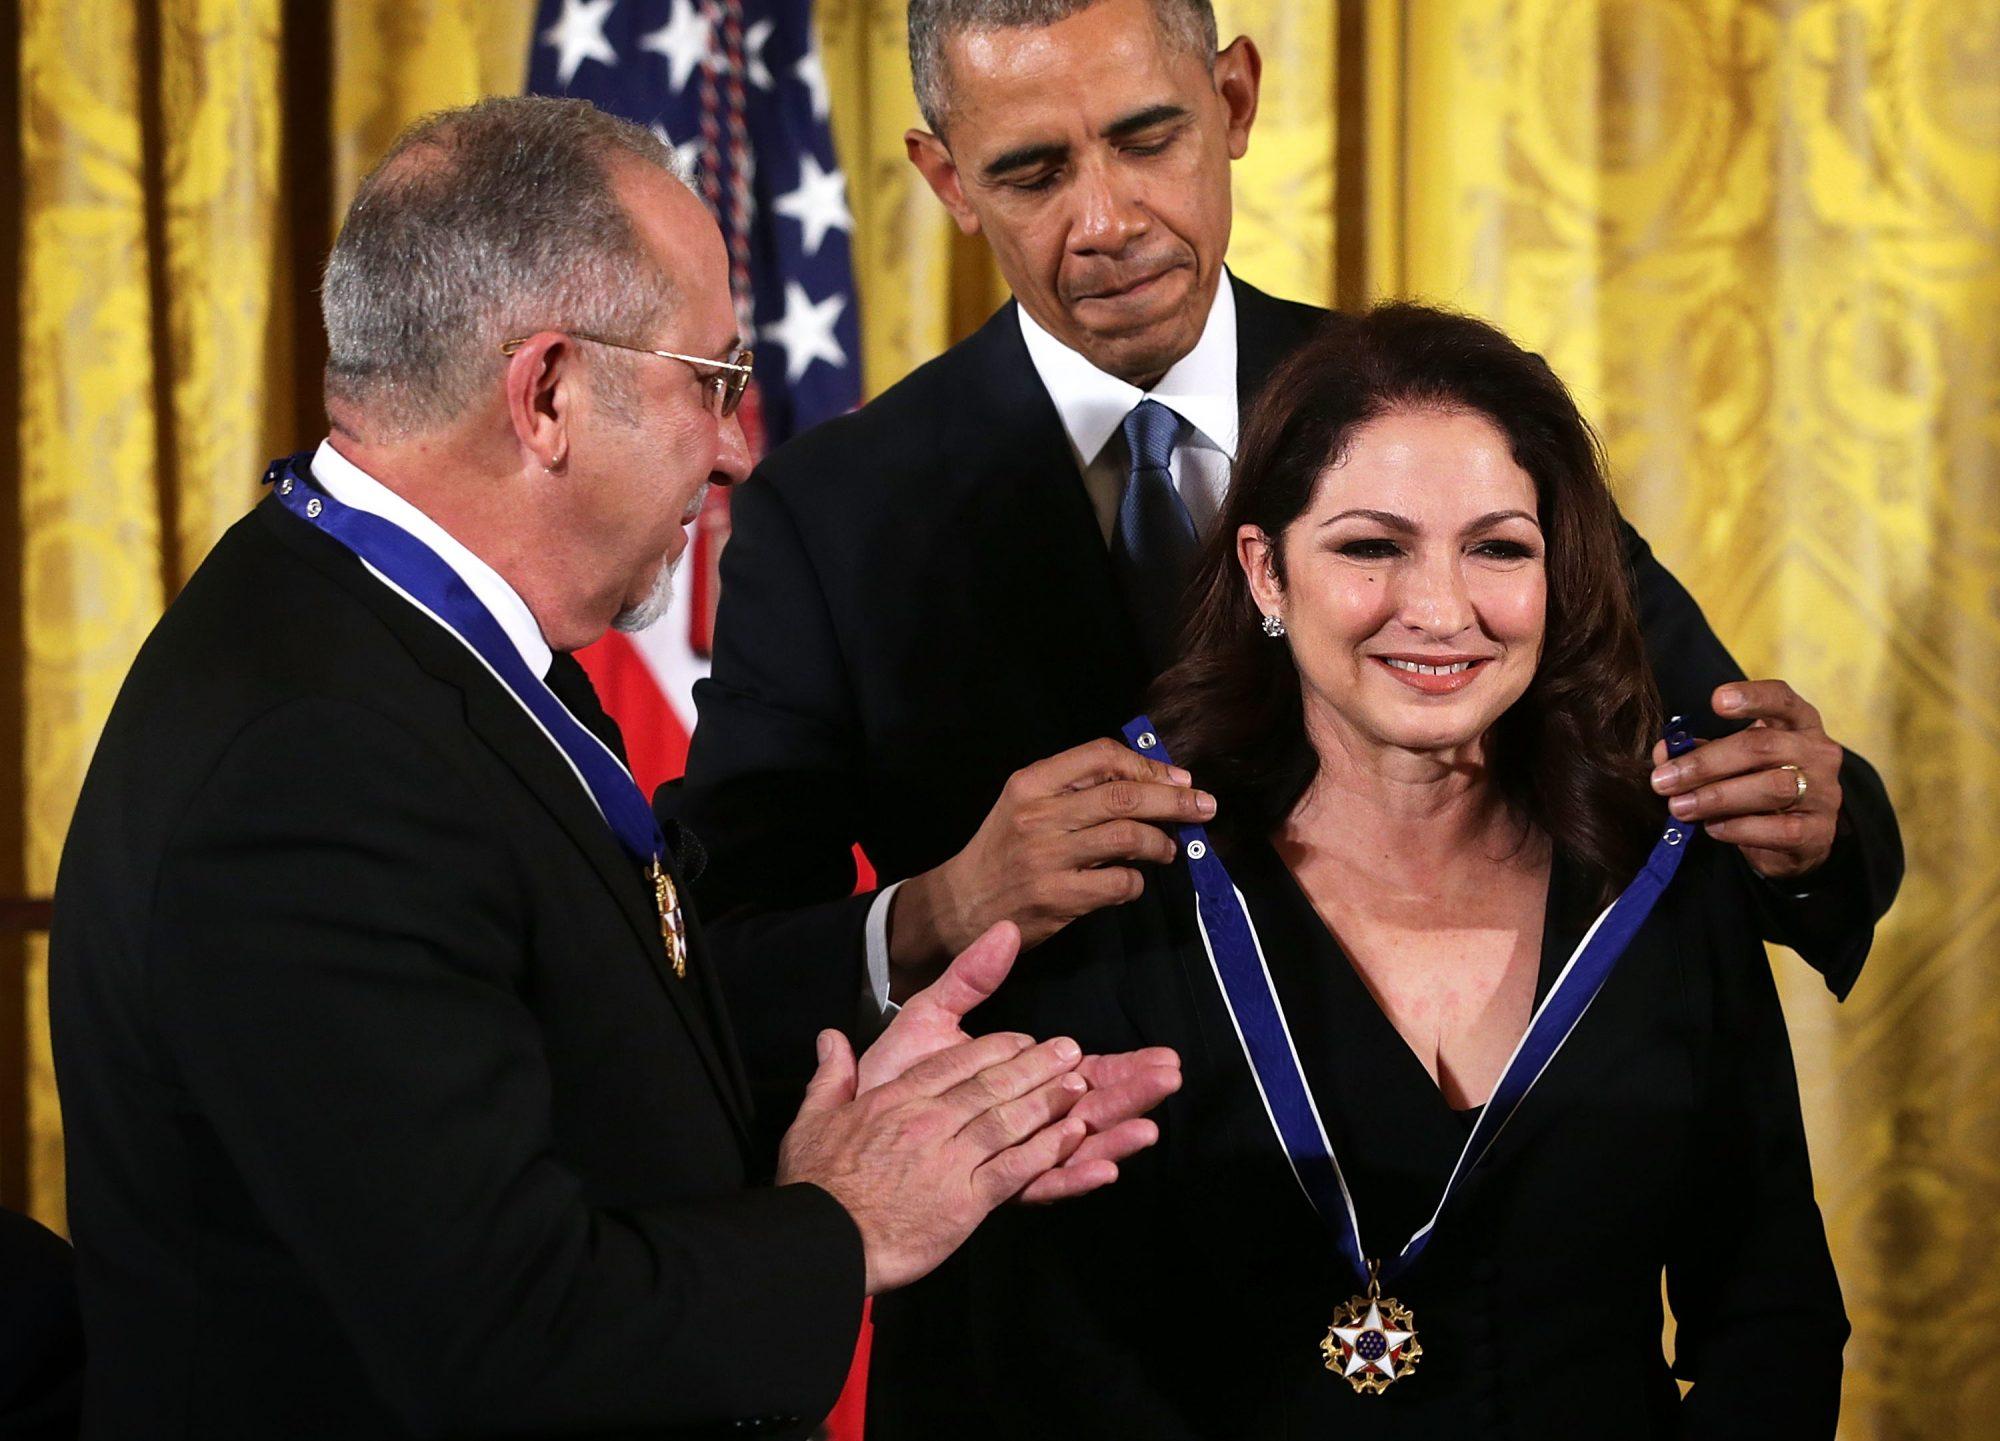 Emilio Estefan, Gloria Estefan, Barack Obama